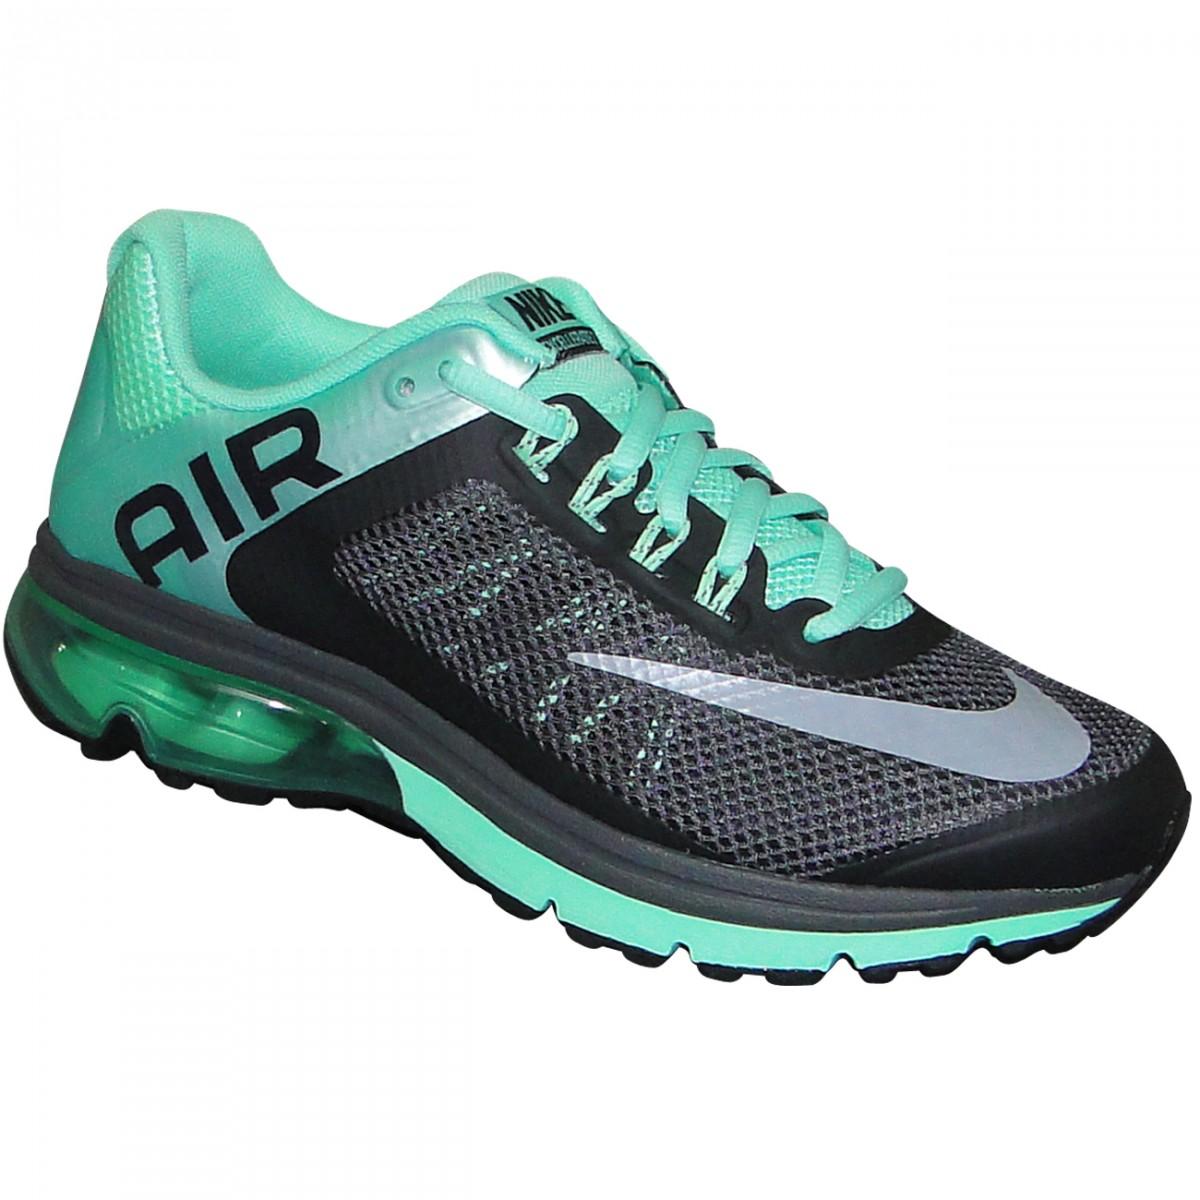 2411acac2 Tenis Nike Air Max Excellerate+ 2 555764 013 - Grafite Verde - Chuteira Nike